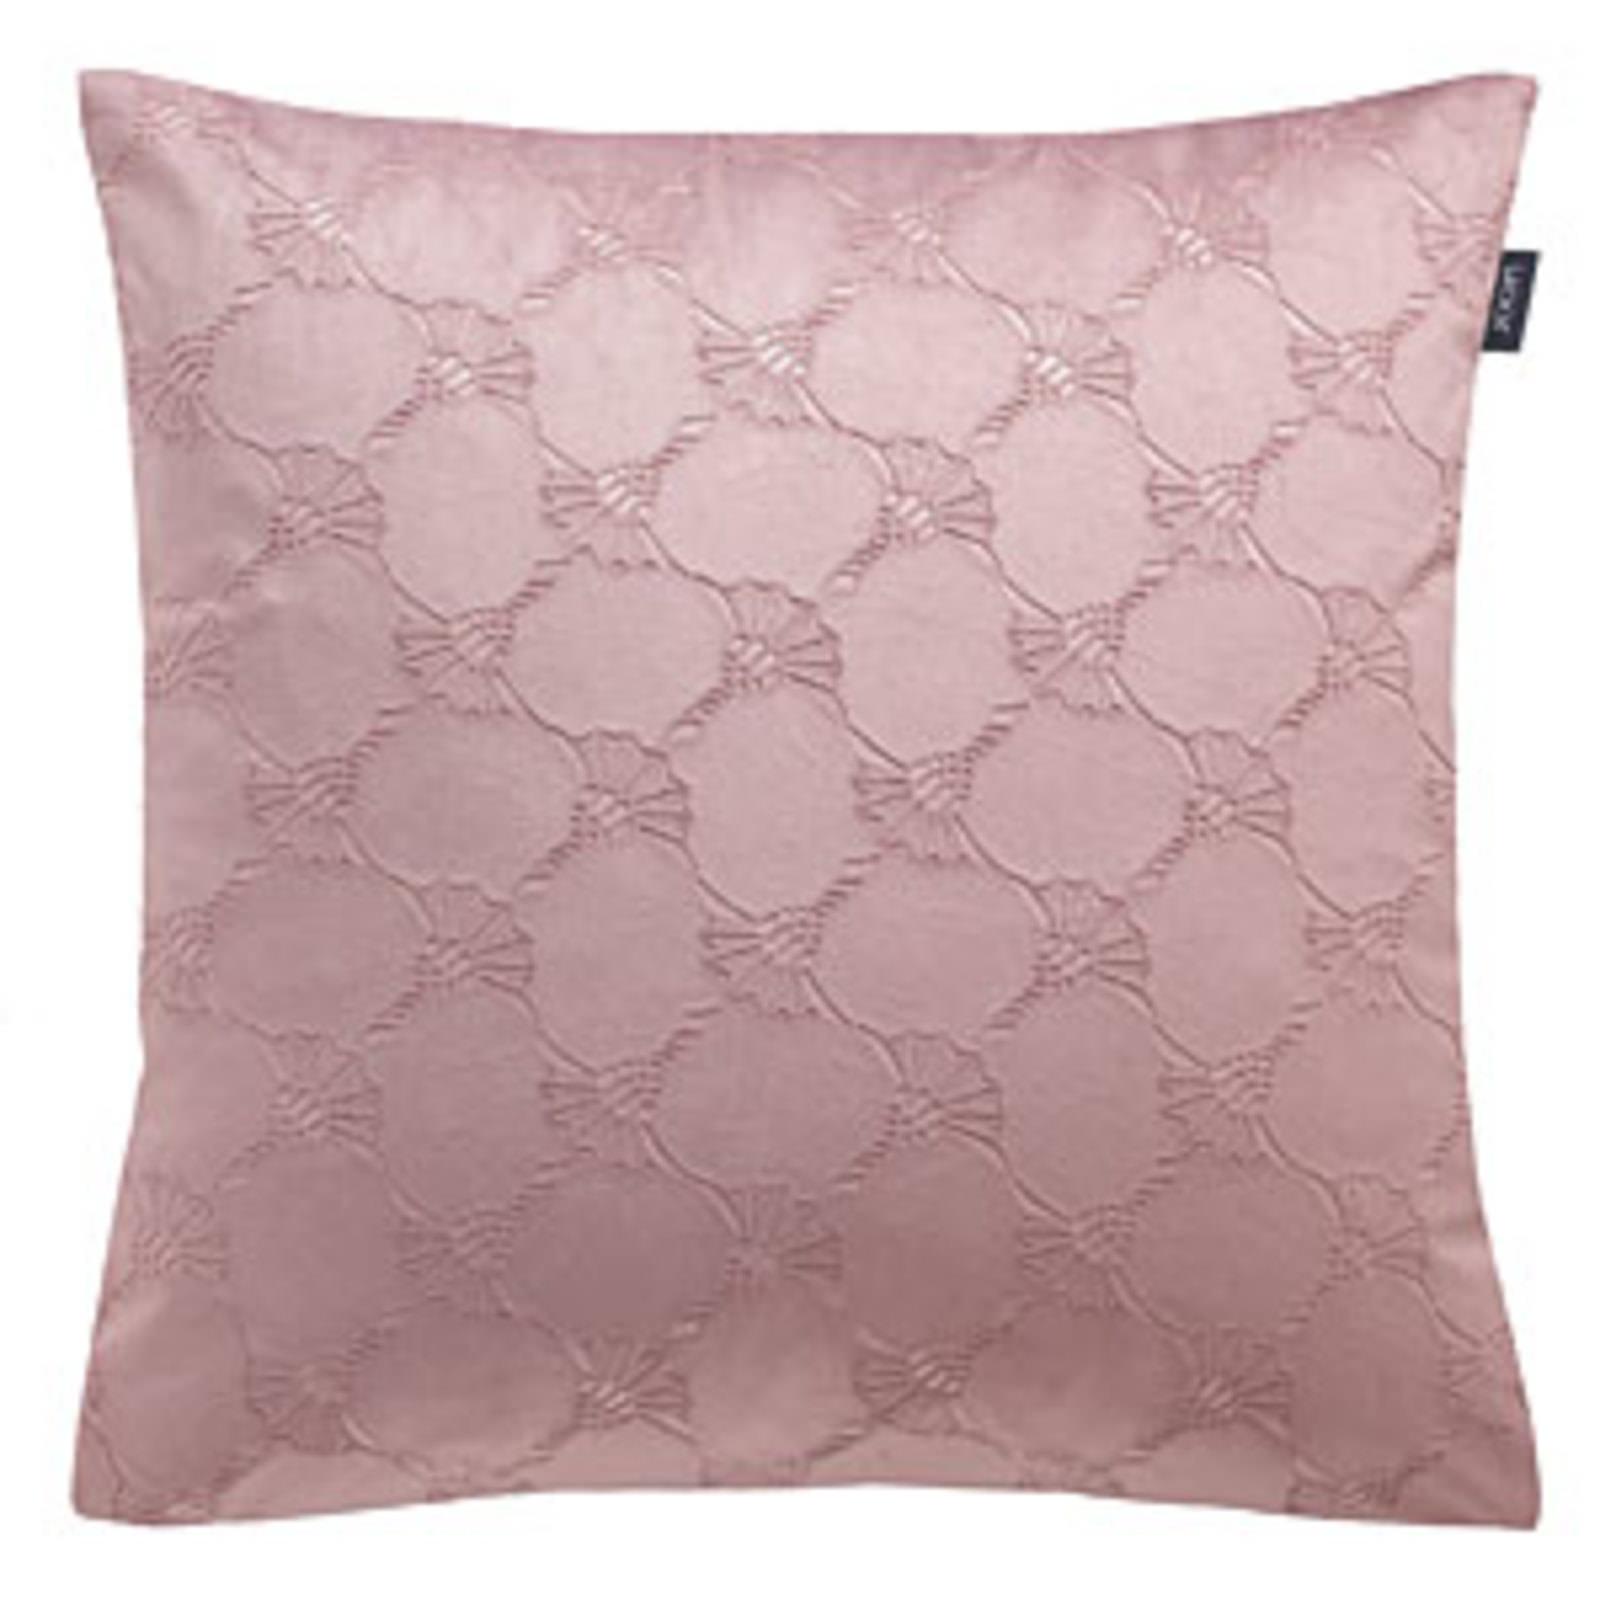 joop joop kissen gef llt online entdecken knuffmann ihr m belhaus. Black Bedroom Furniture Sets. Home Design Ideas